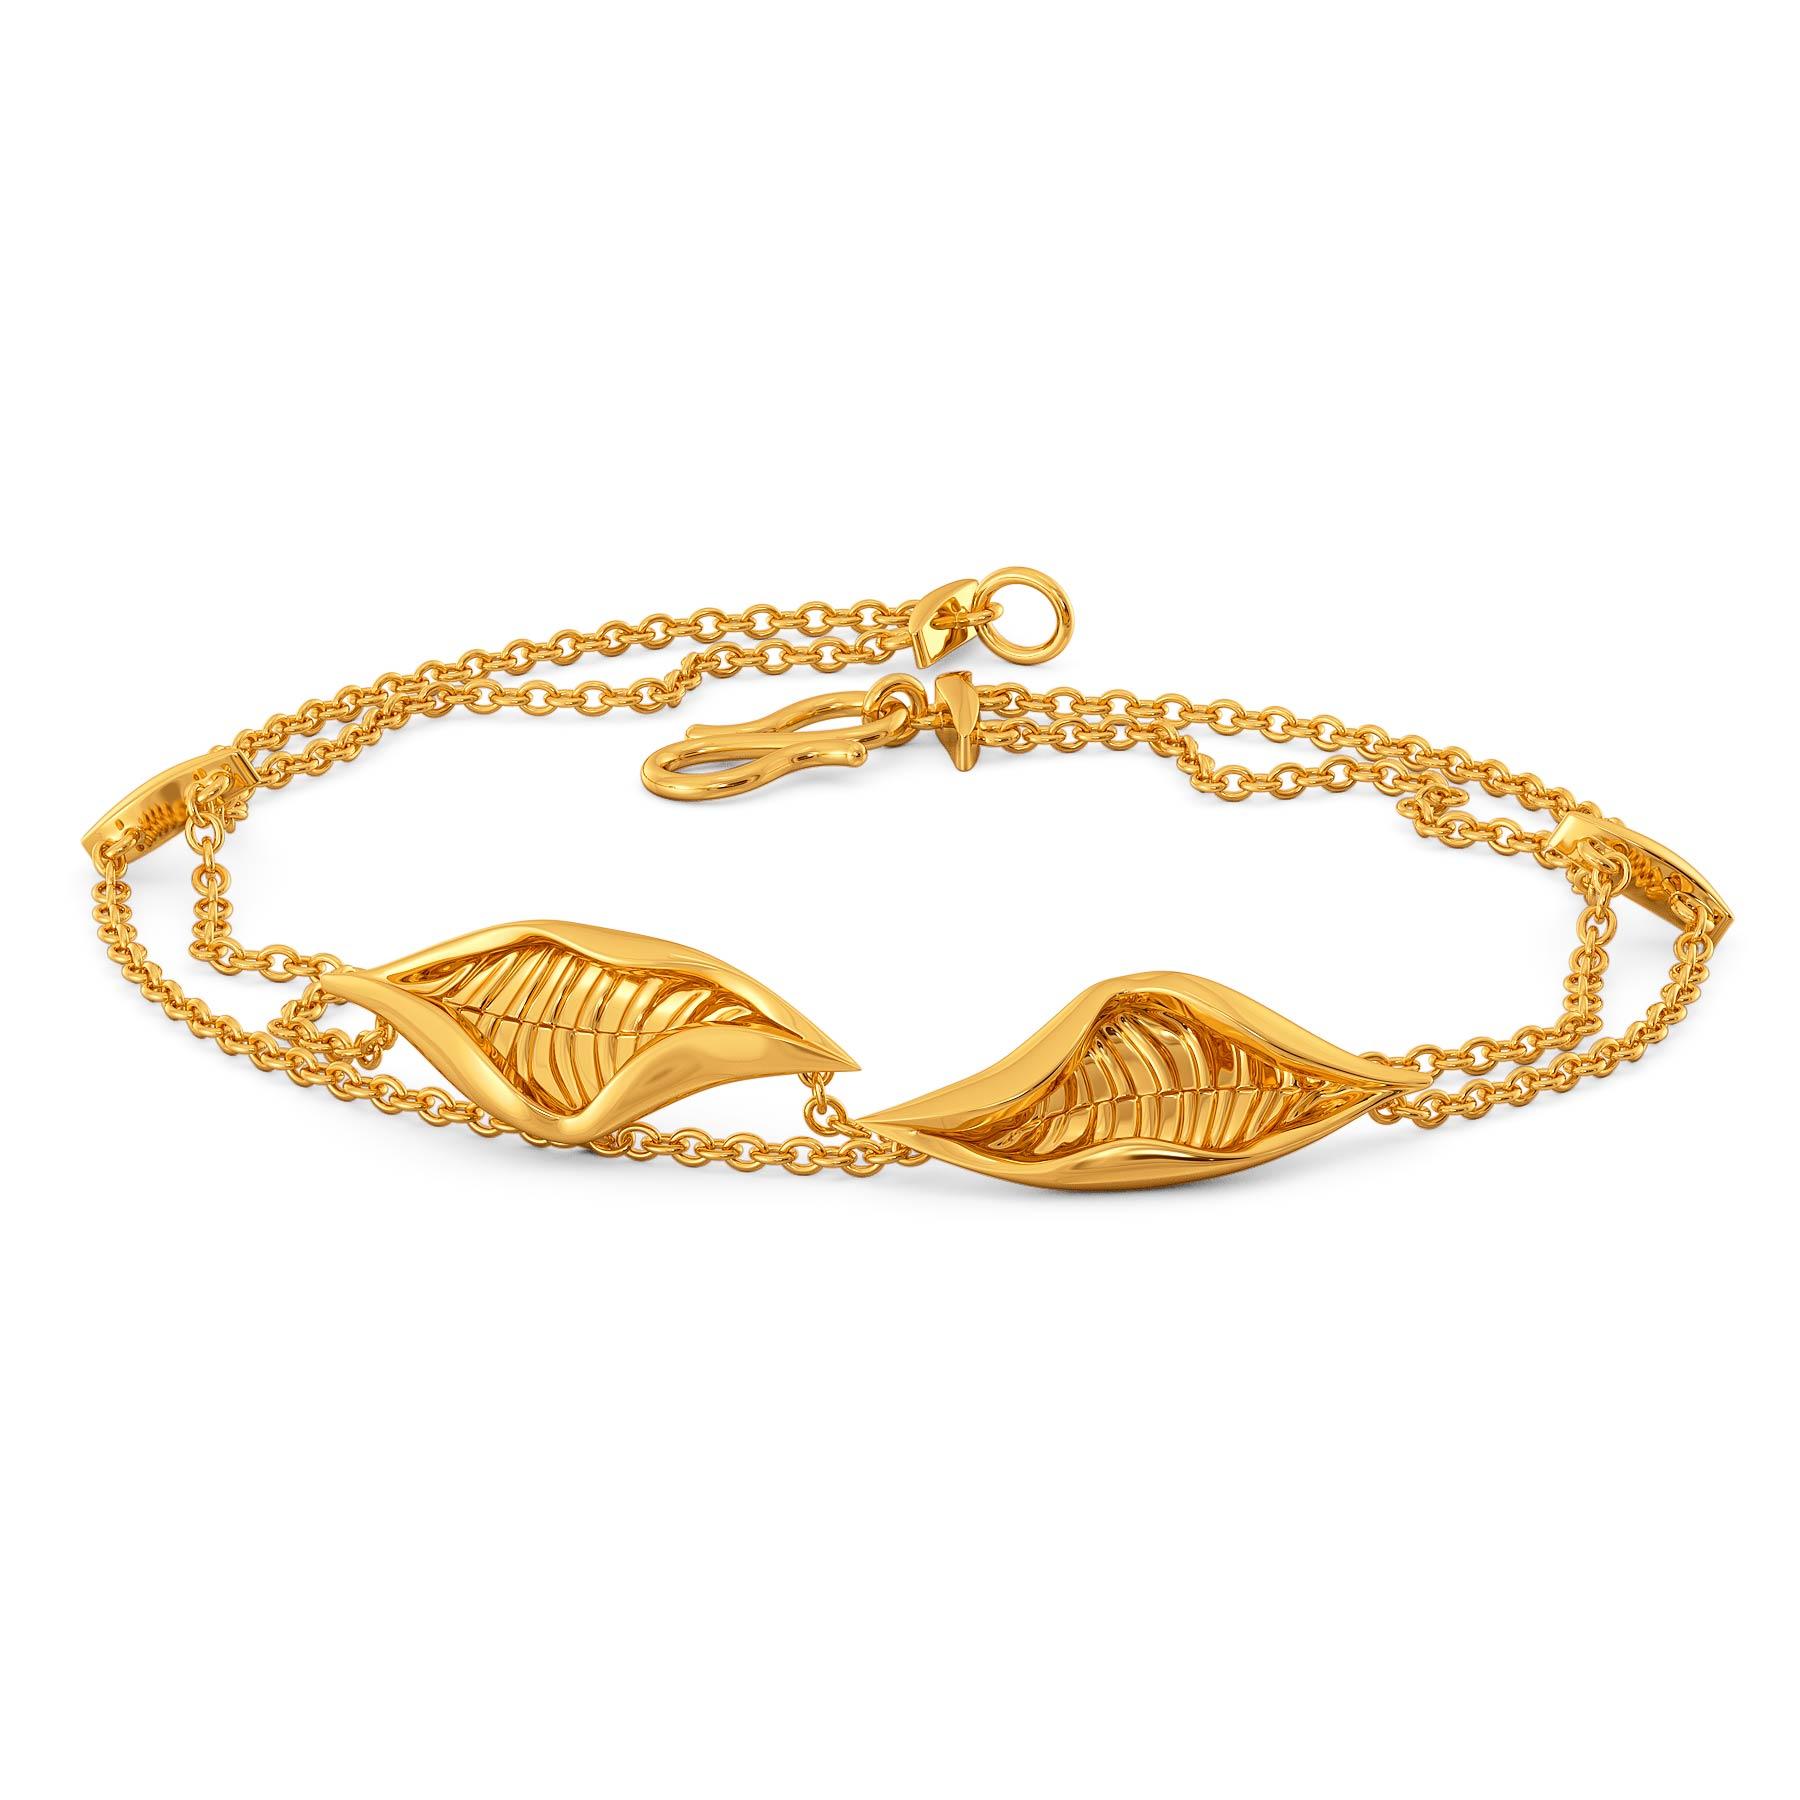 Lure of Verdure Gold Bracelets